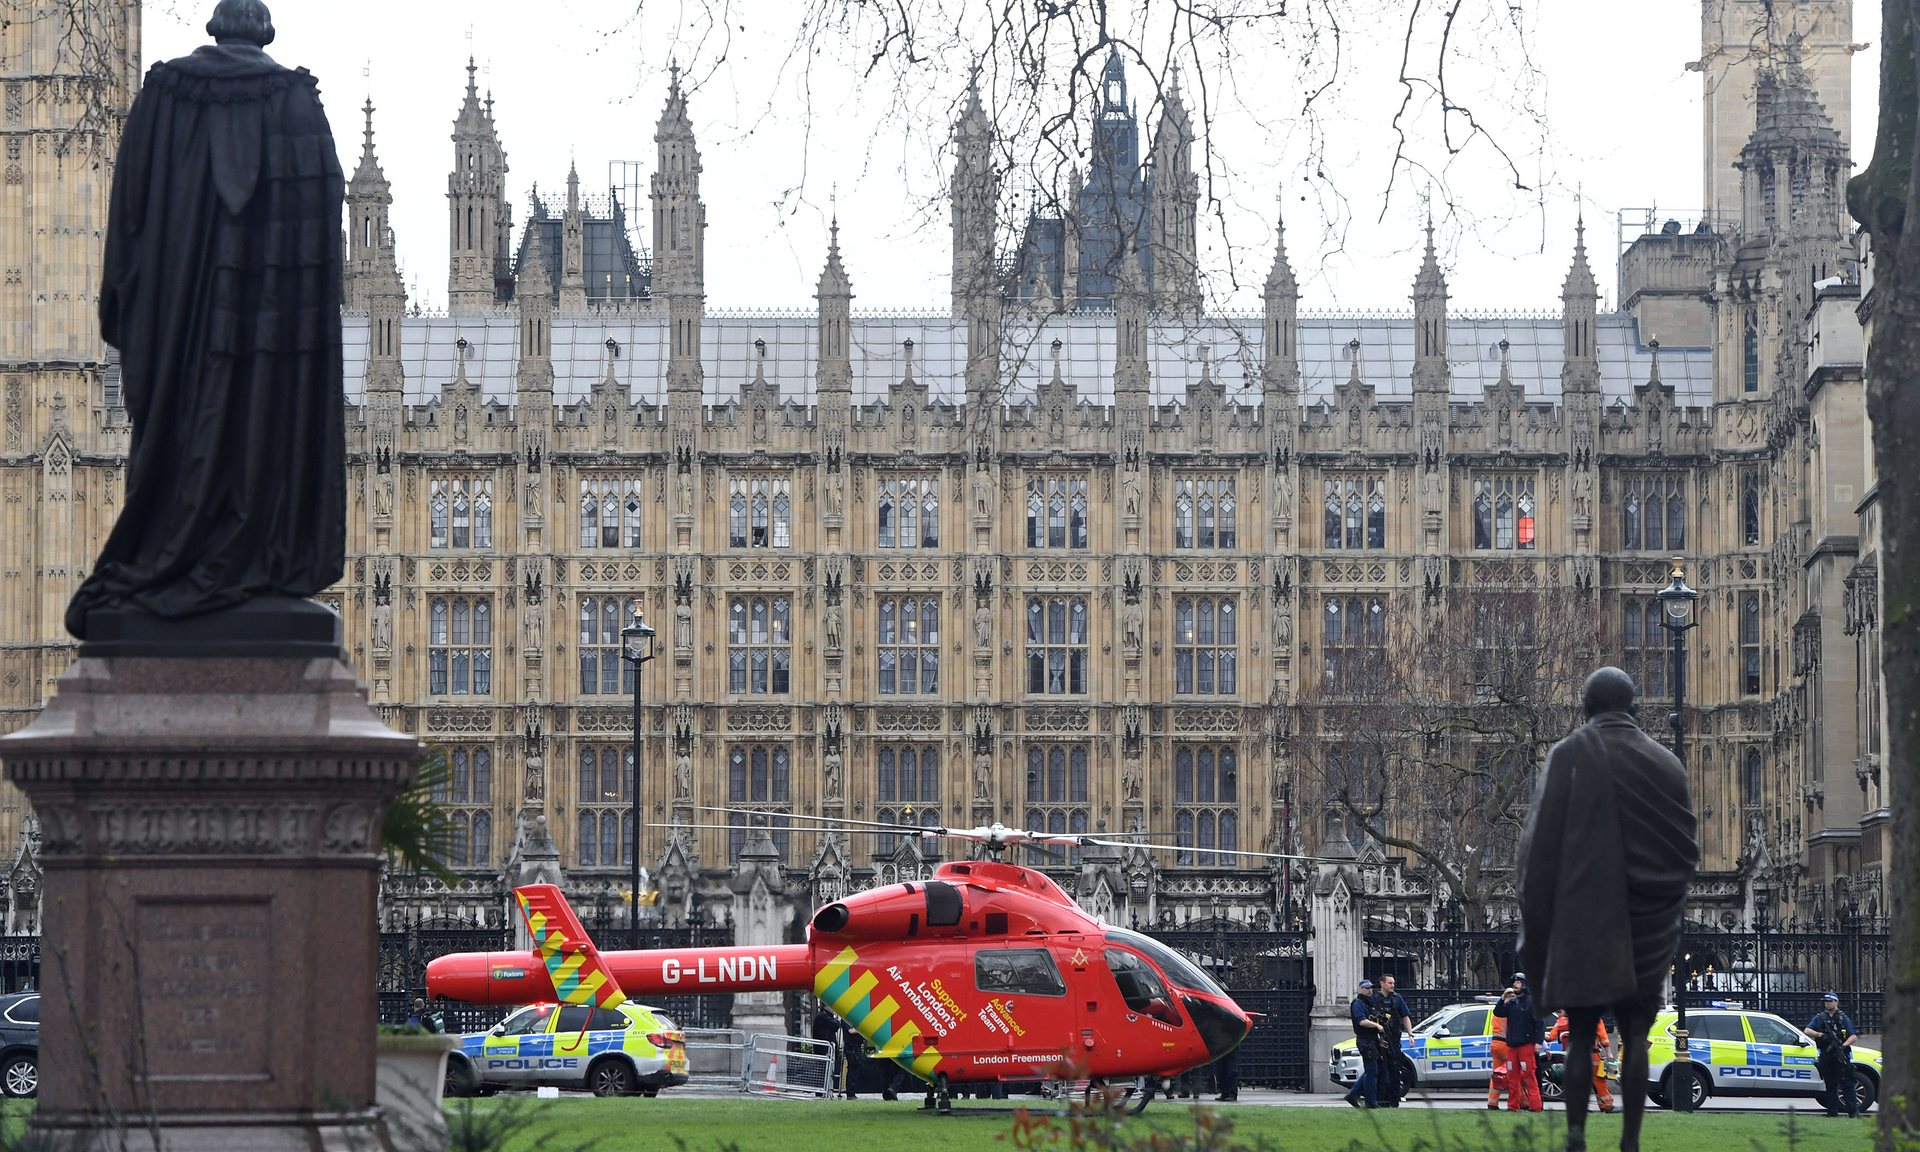 英国政治心脏遭遇恐怖袭击